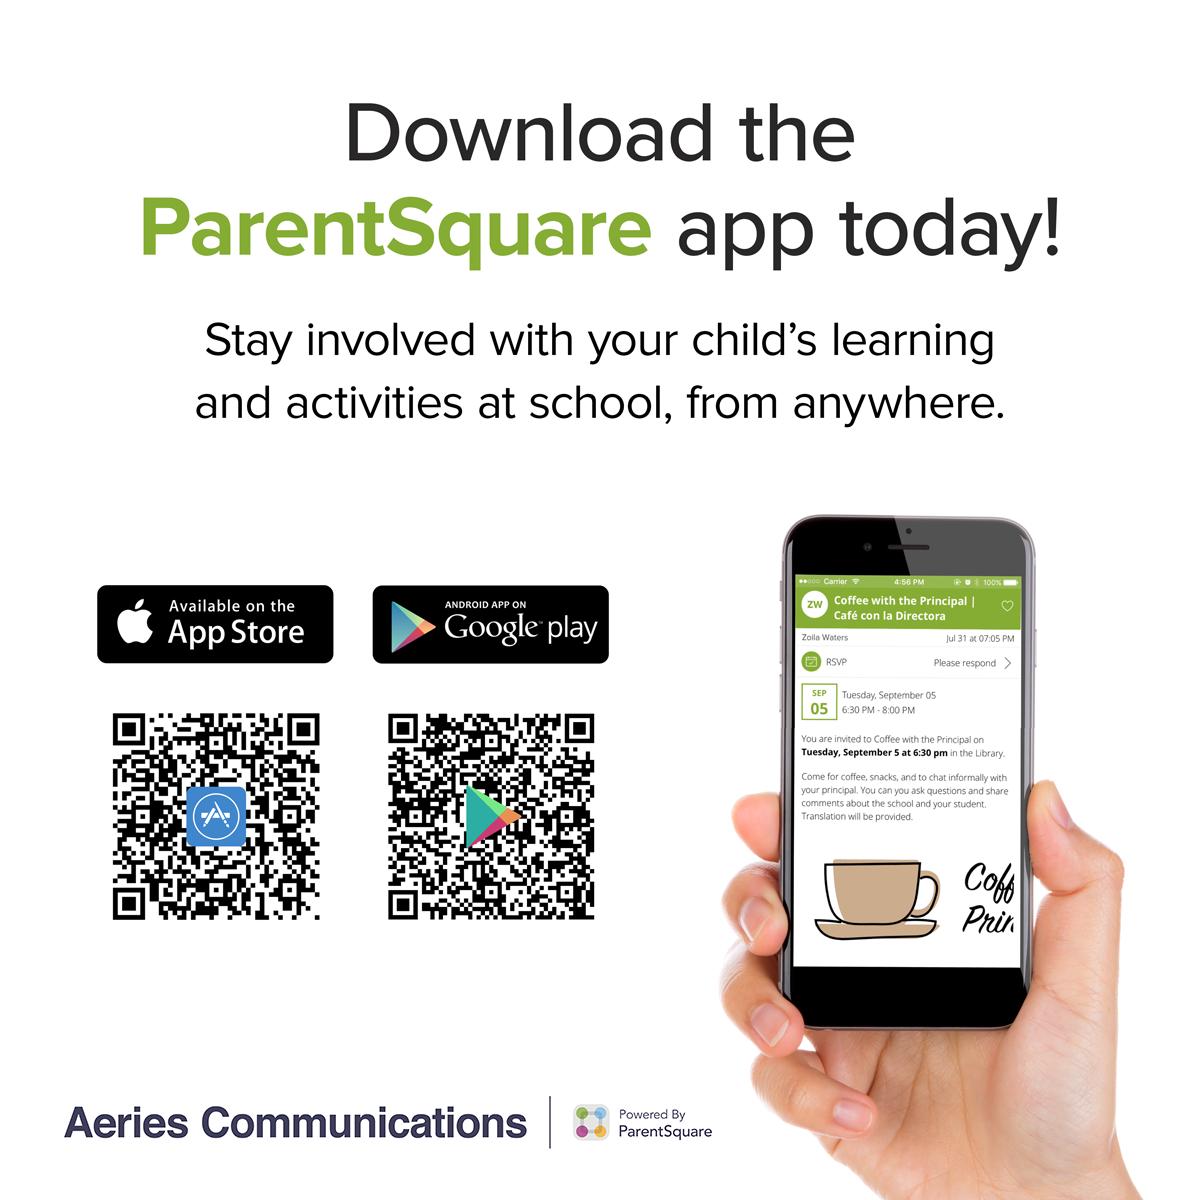 QR codes to download the ParentSquare app